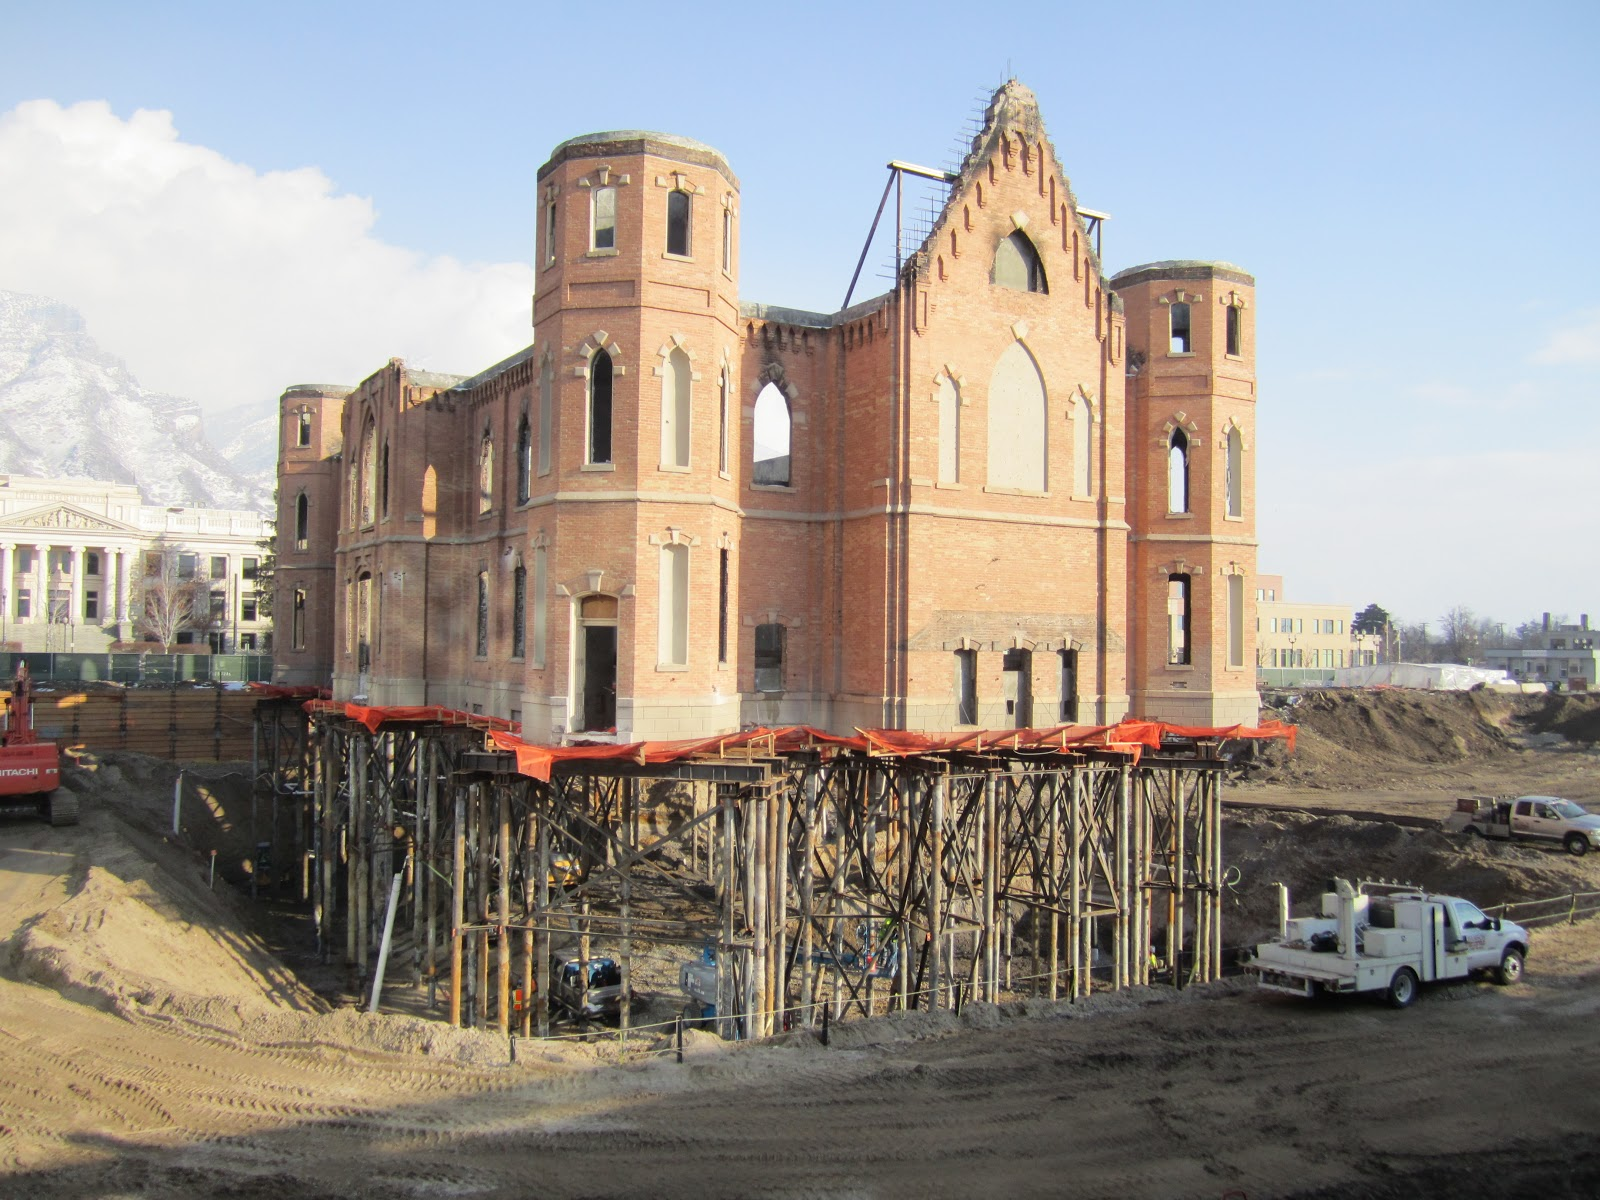 Great Scot Lds Provo City Center Temple Progress Feb 2013